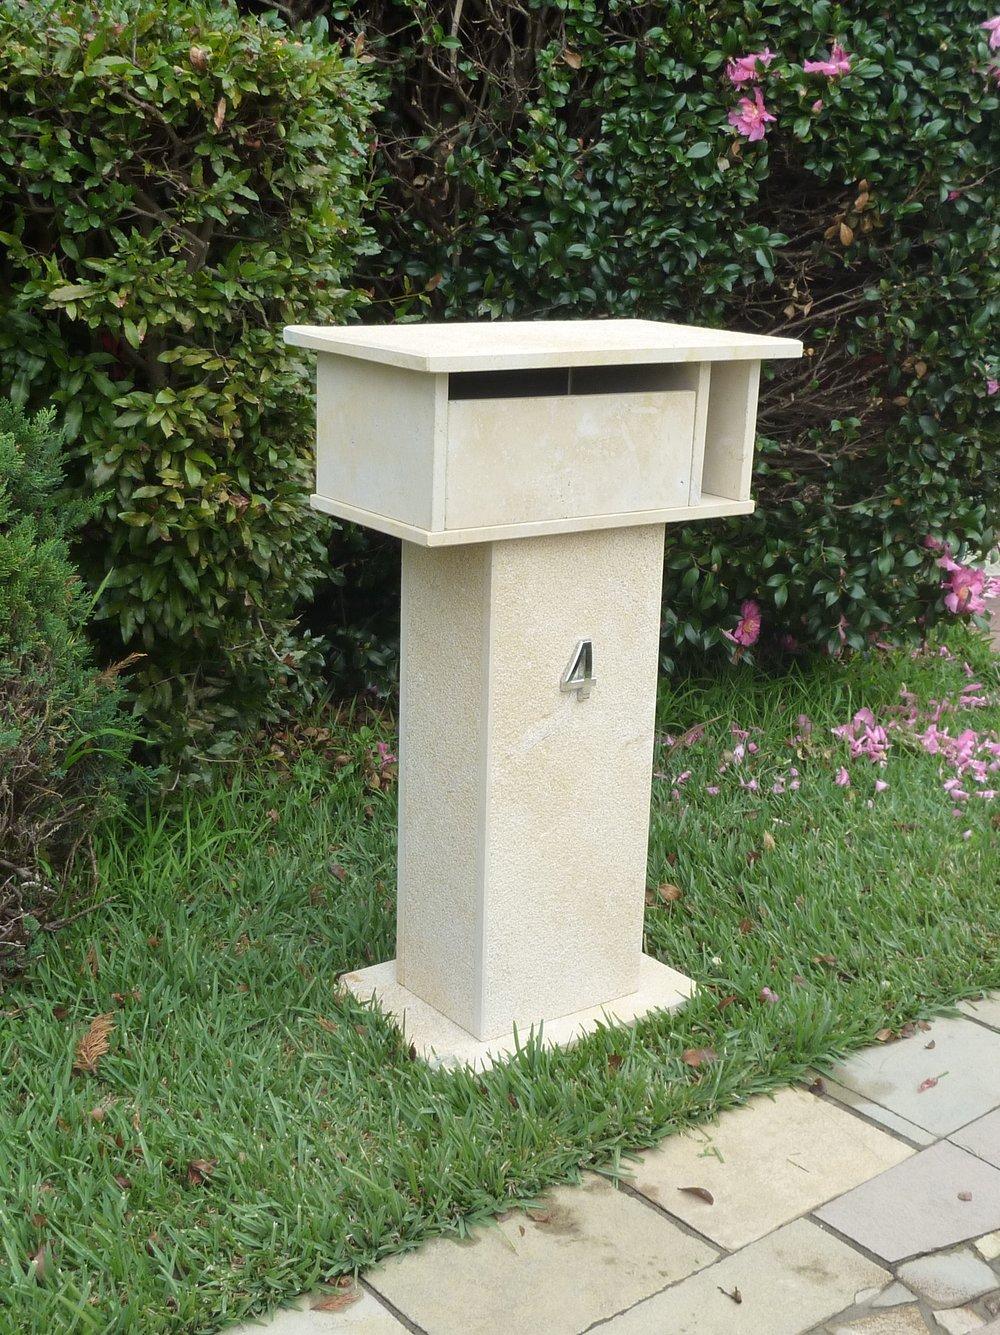 7a. Limestone Letterbox 820 high takes A4 envelopes aluminium back door with 2 key lock 820x500x290 $480